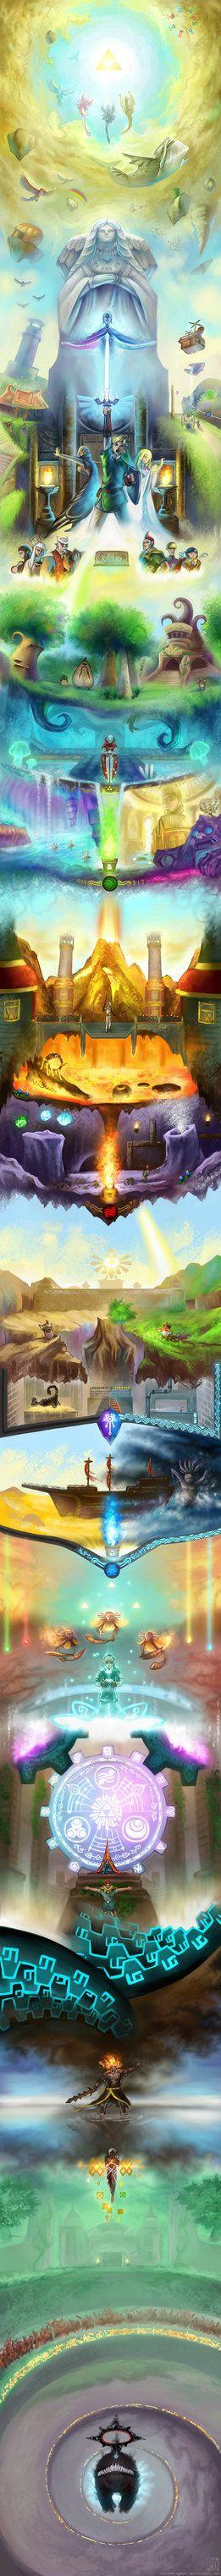 Skyward Sword art